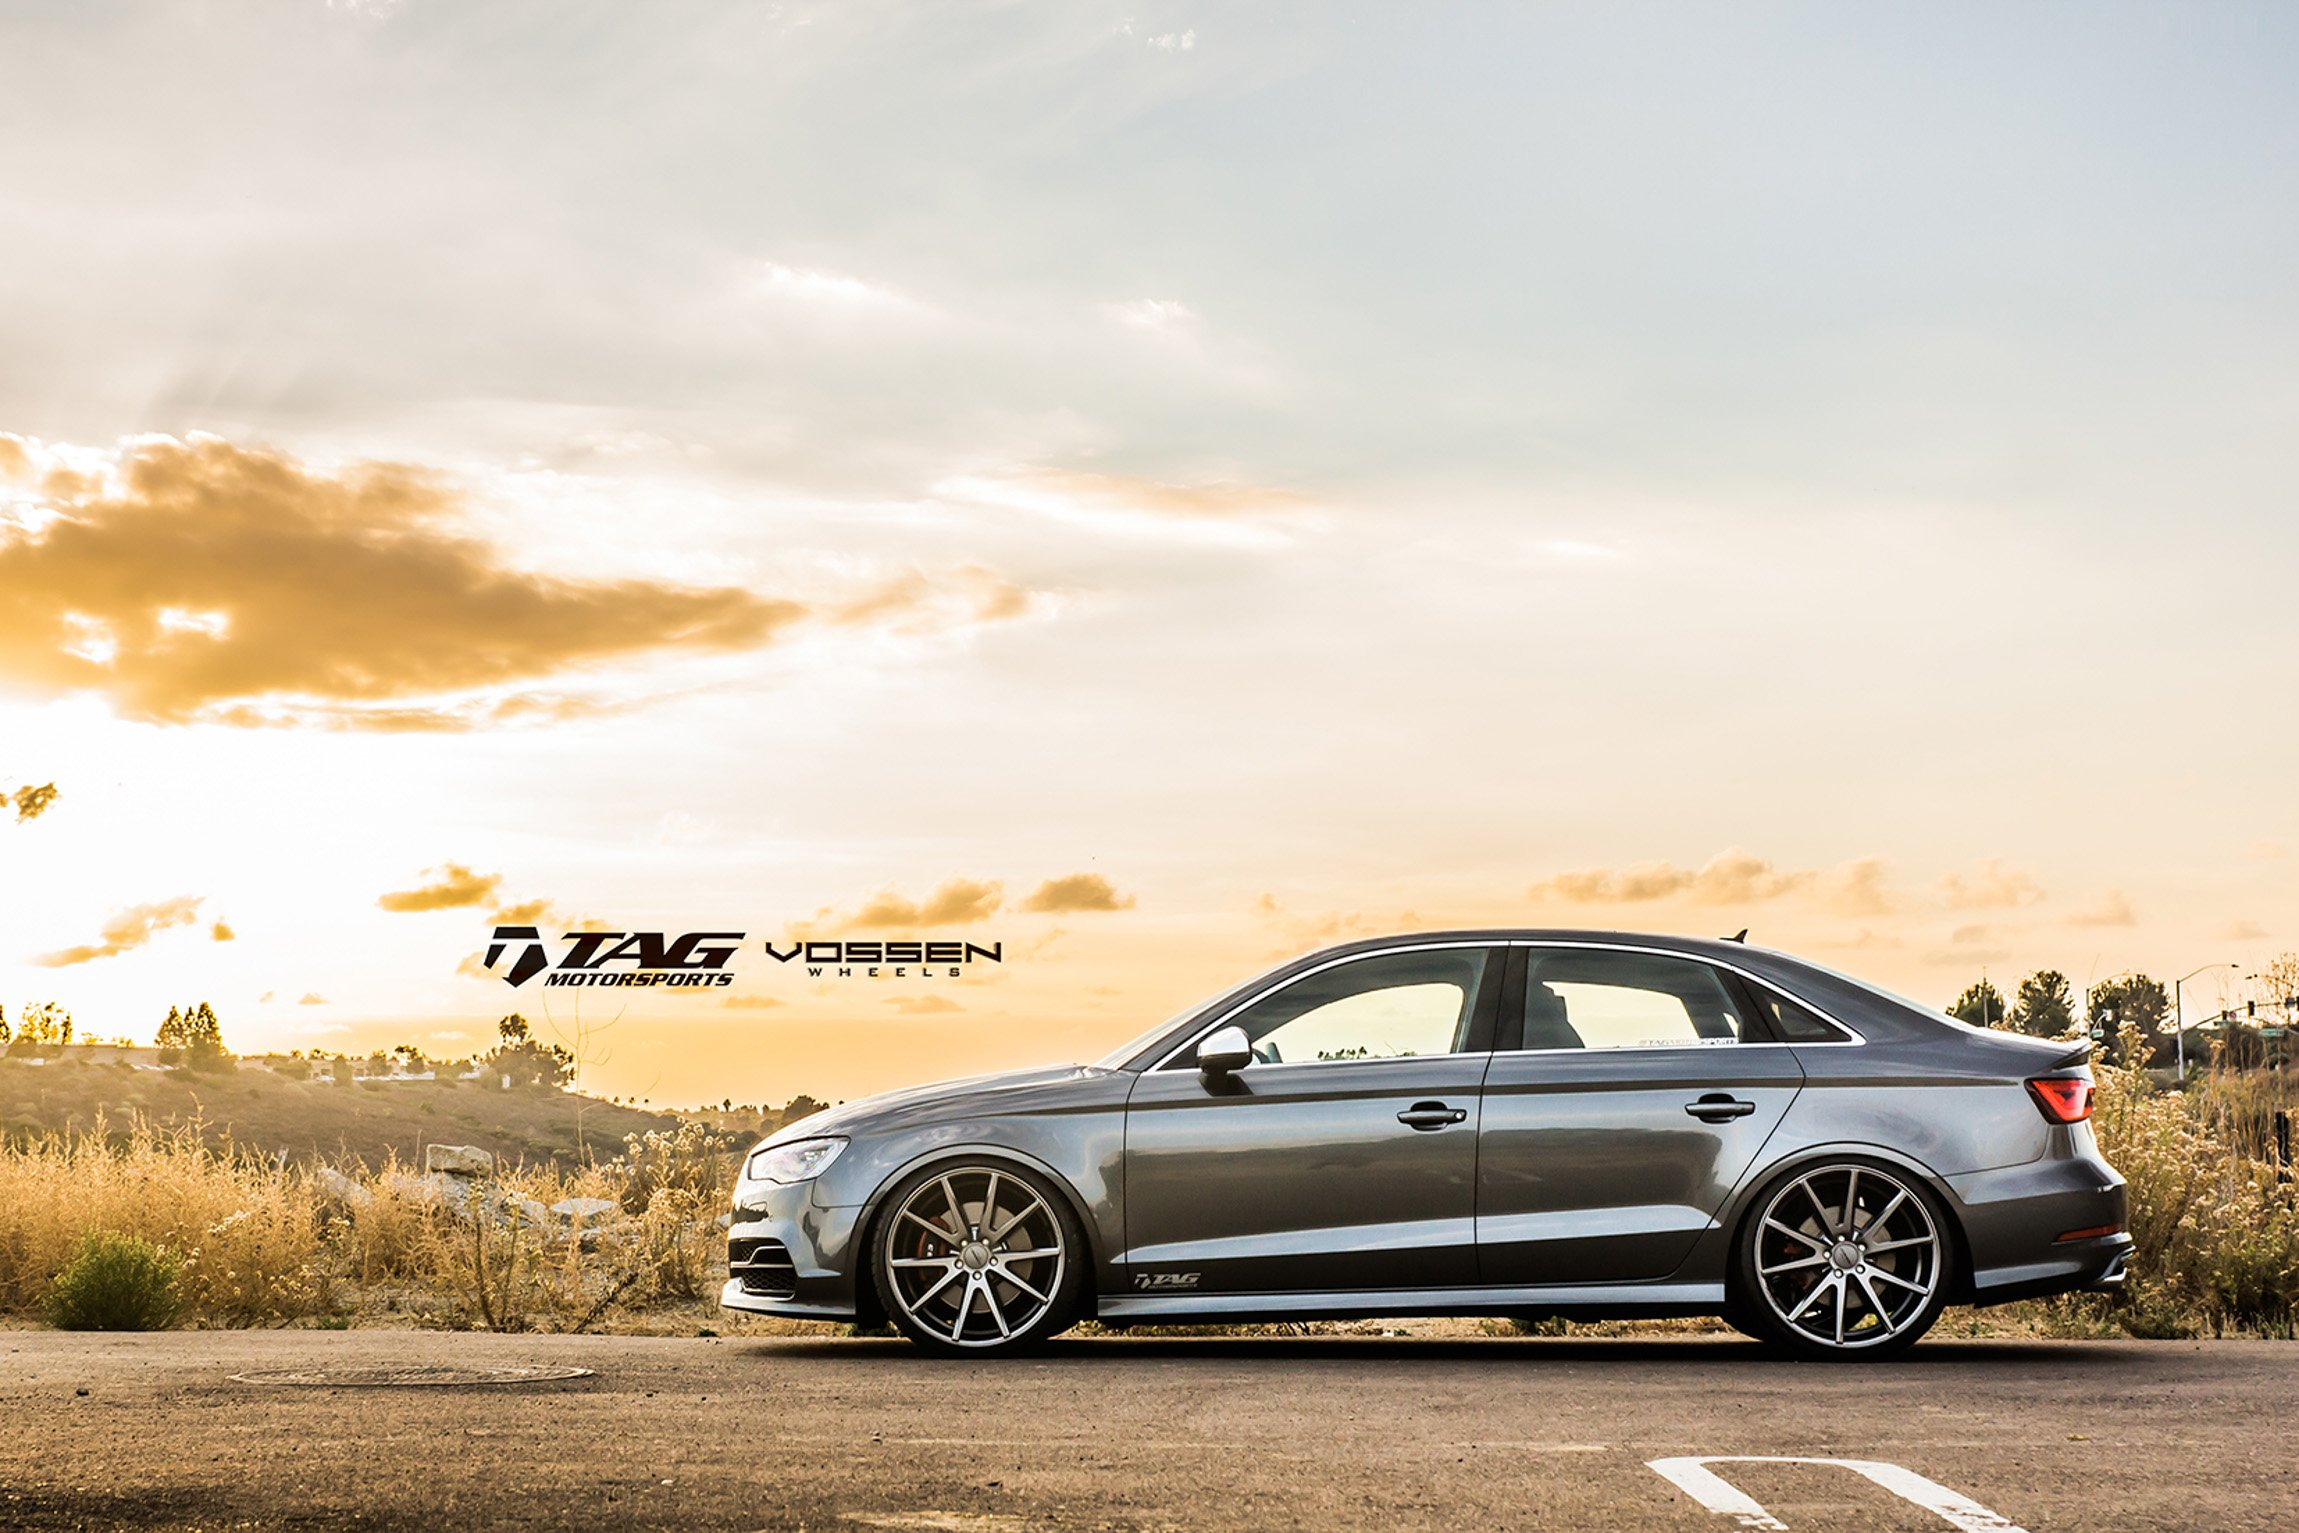 Audi Rs3 Wallpaper Hd 2014 Vossen Wheel Tuning Audi S3 Cars Sedan Grey Wallpaper